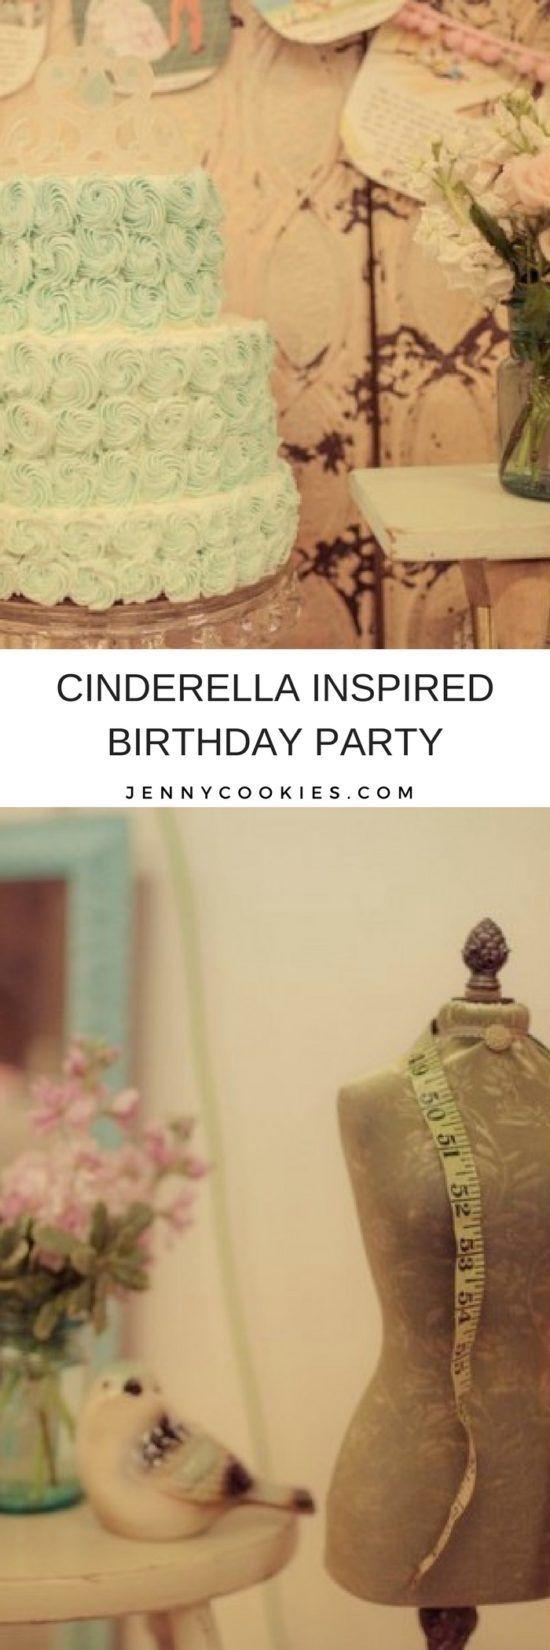 74 best Princess Party Ideas images on Pinterest | Princess party ...